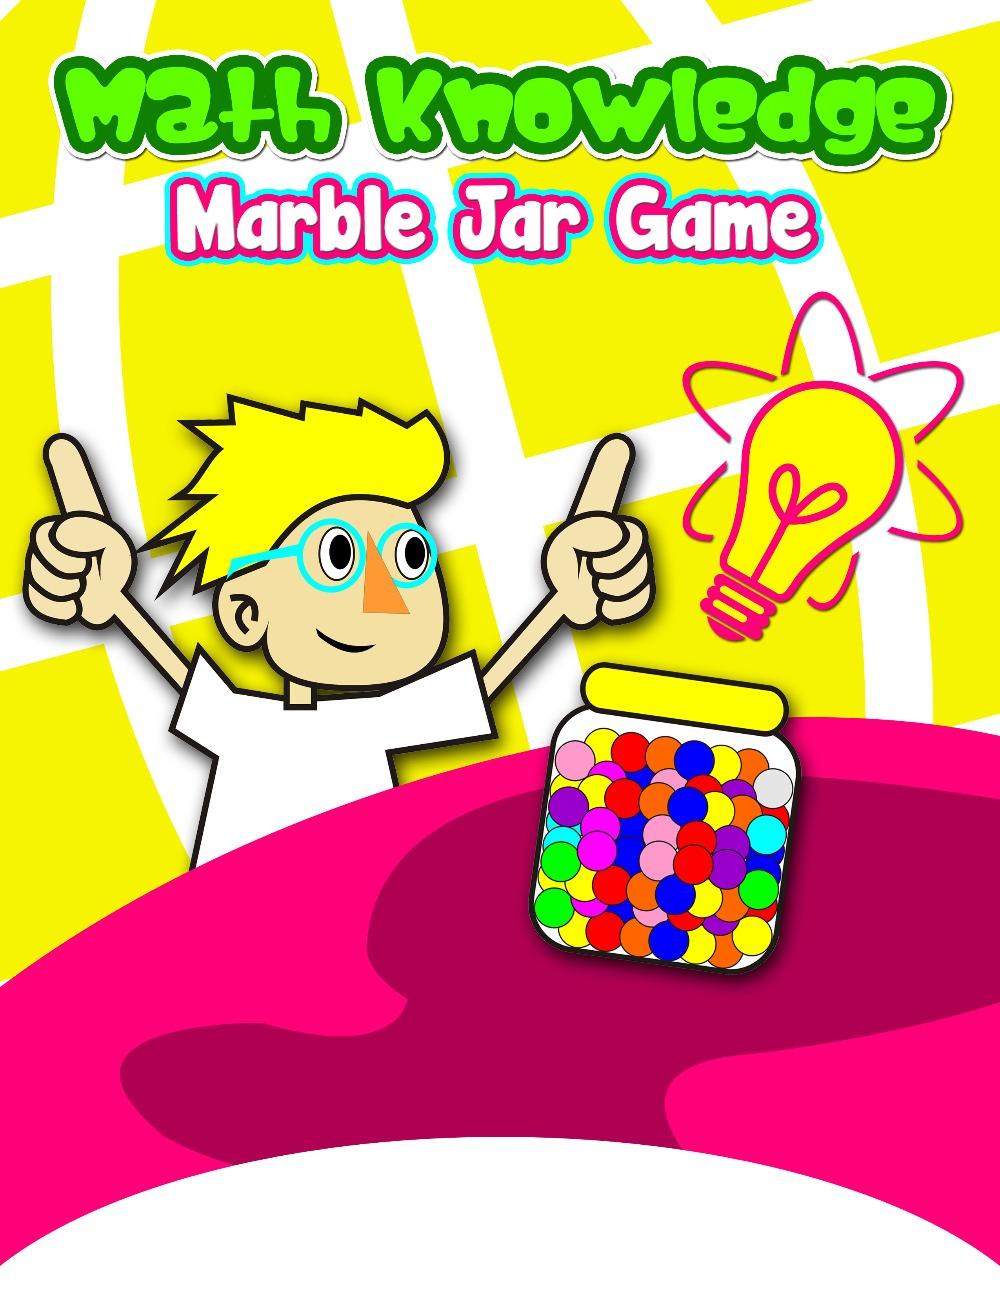 Marble clipart math game Jar MathFileFolderGames com Value Knowledge